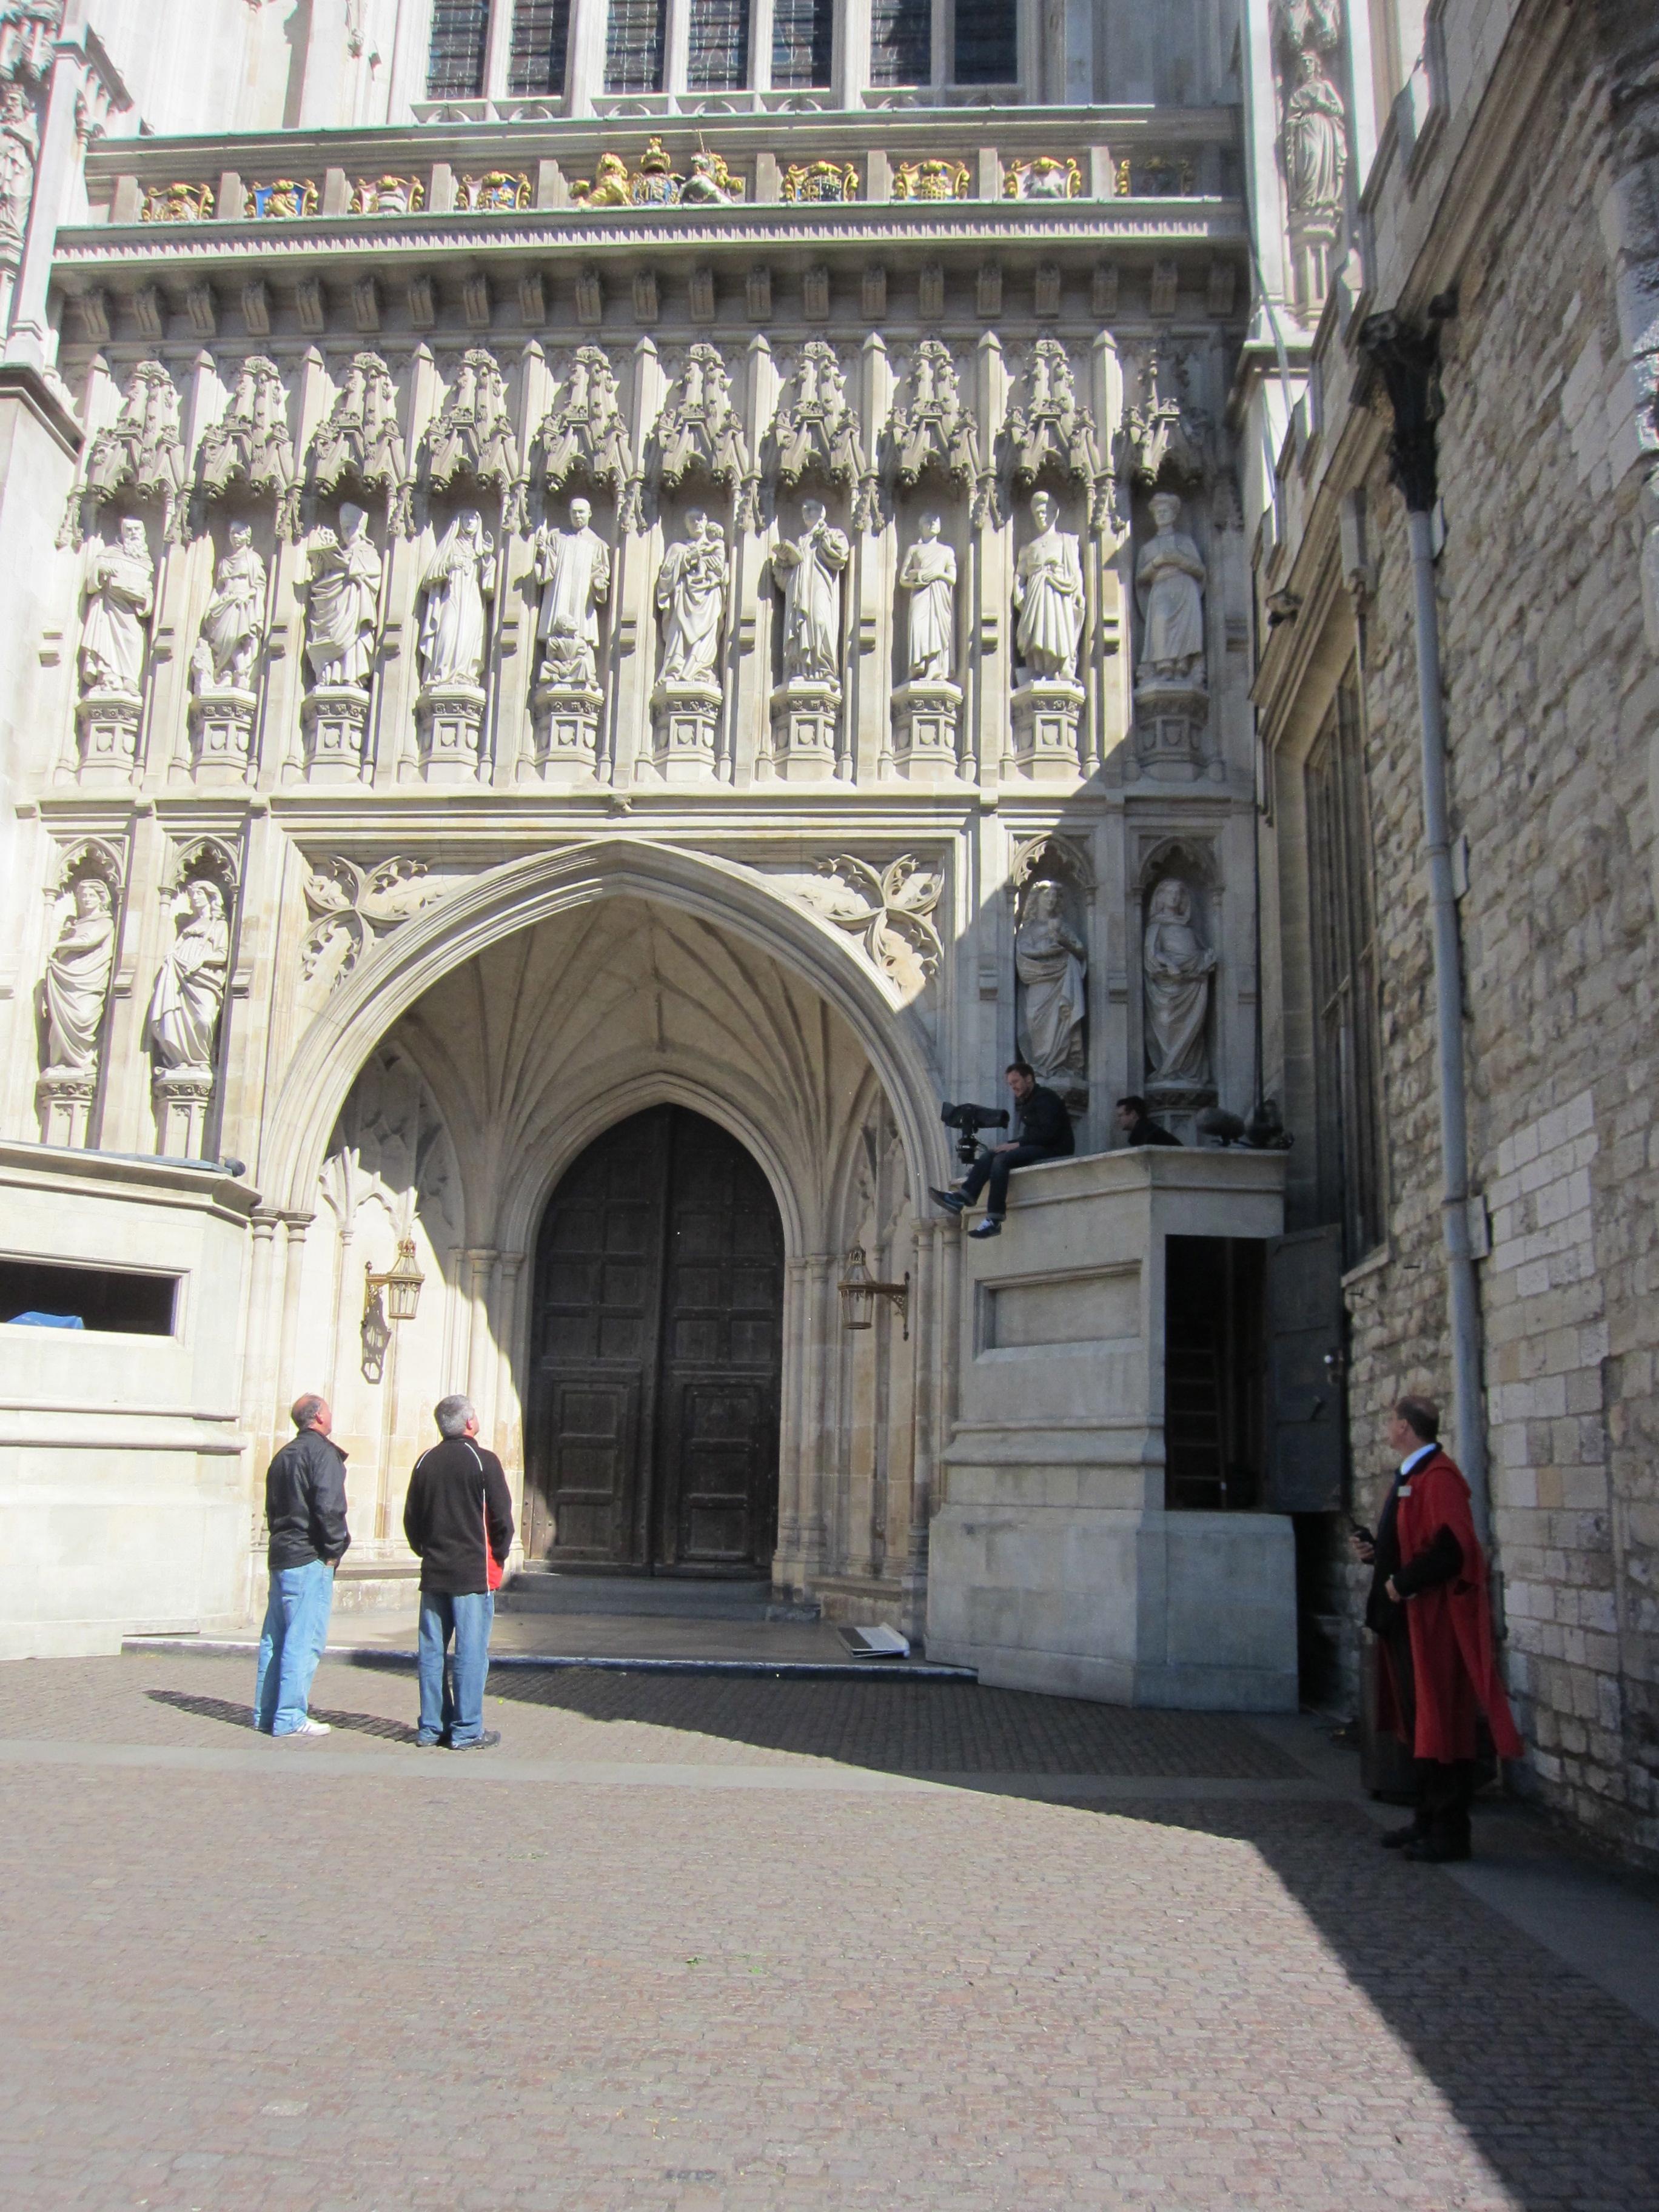 Westminster Abbey, Royal wedding prep